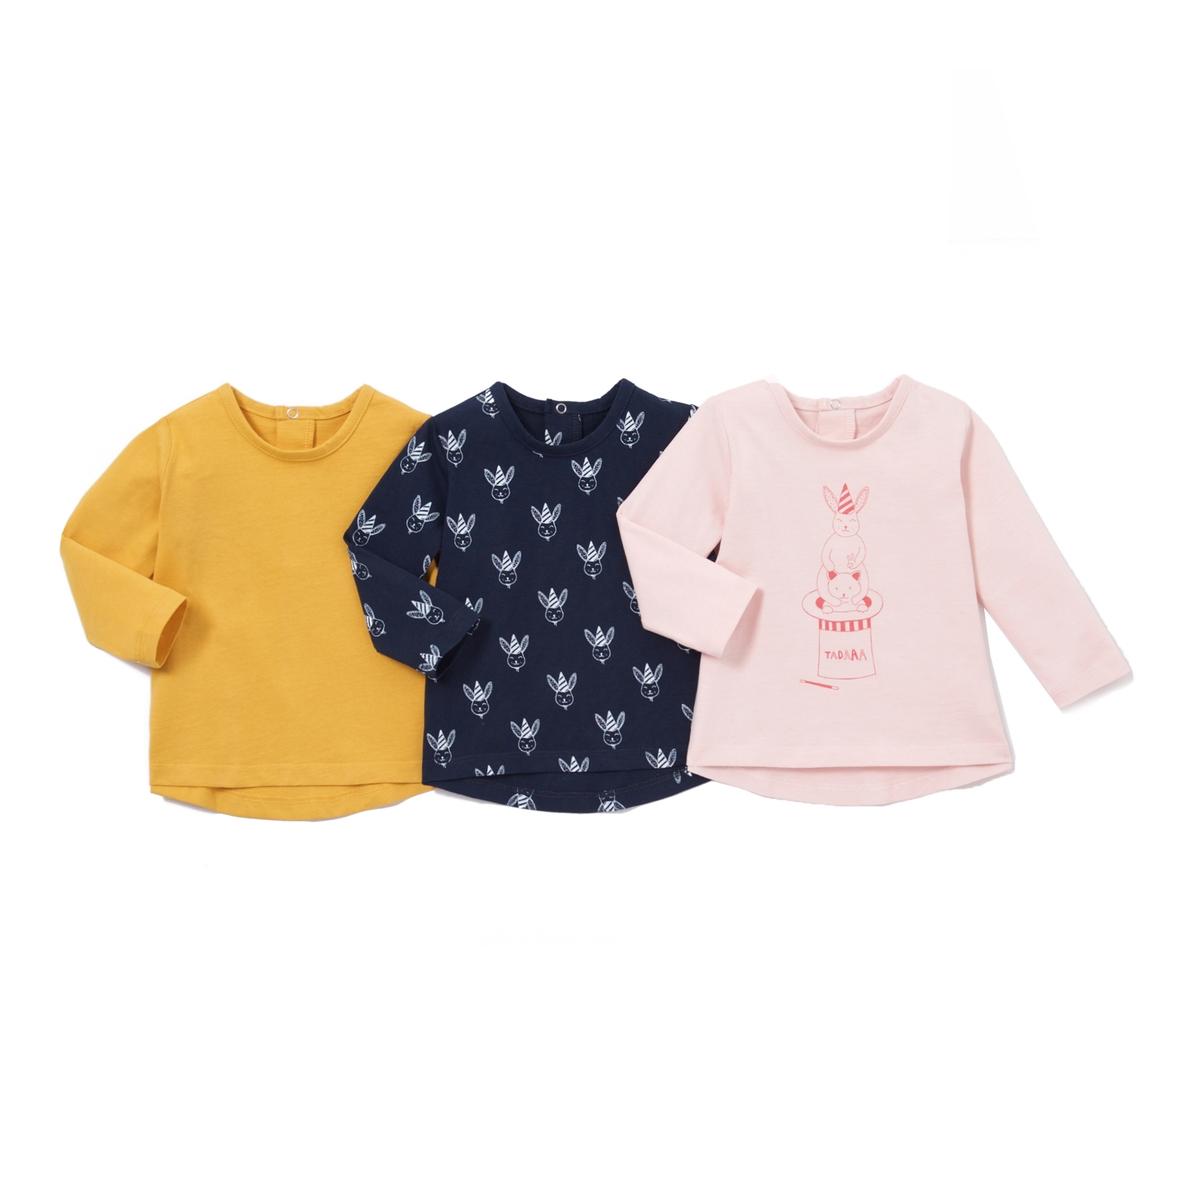 3 футболки 1 мес-3 летOeko Tex